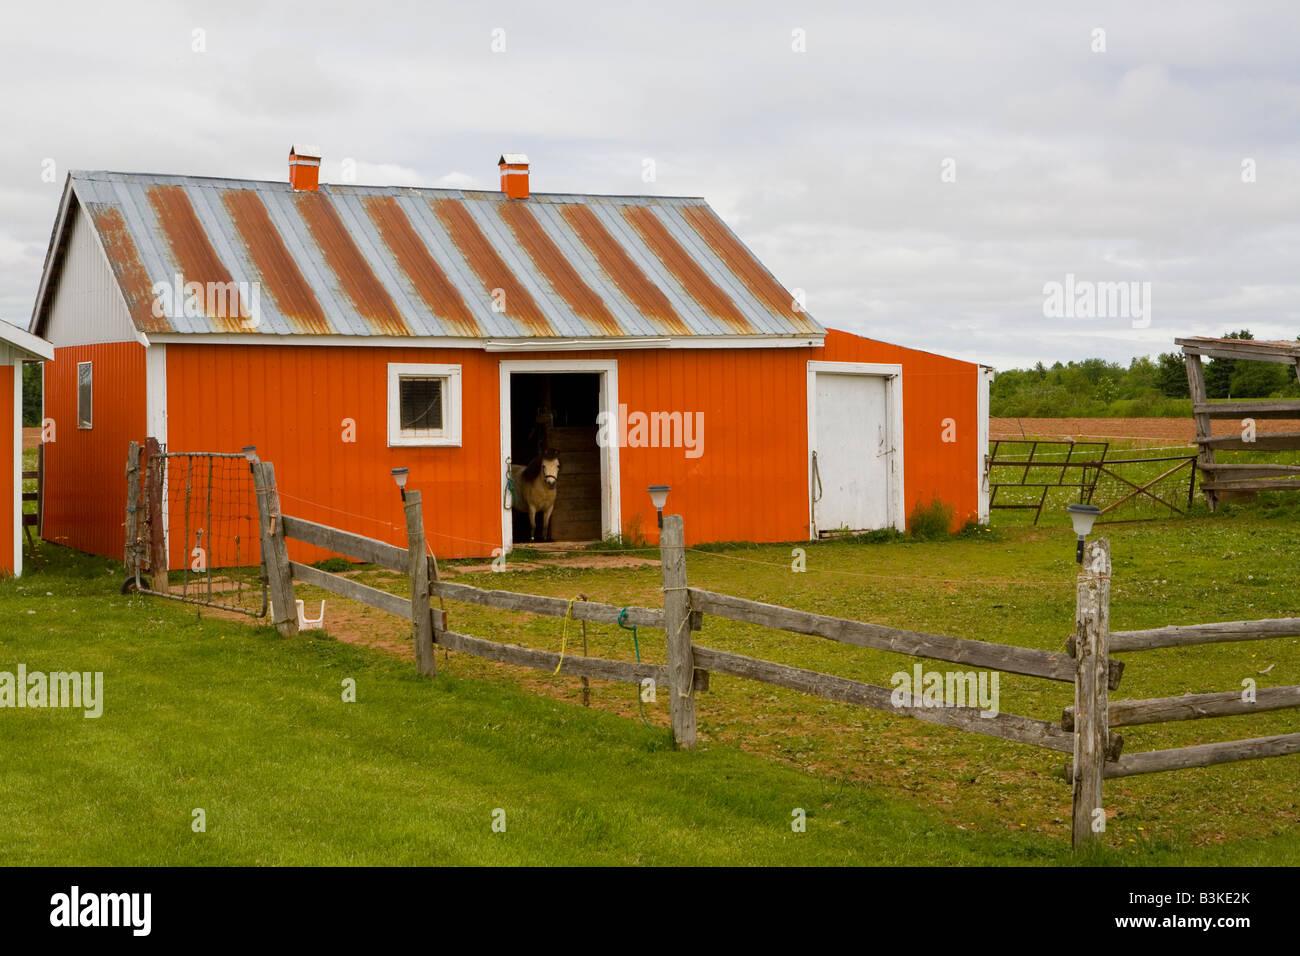 Pony Stable Coleman Prince County Prince Edward Island Canada - Stock Image